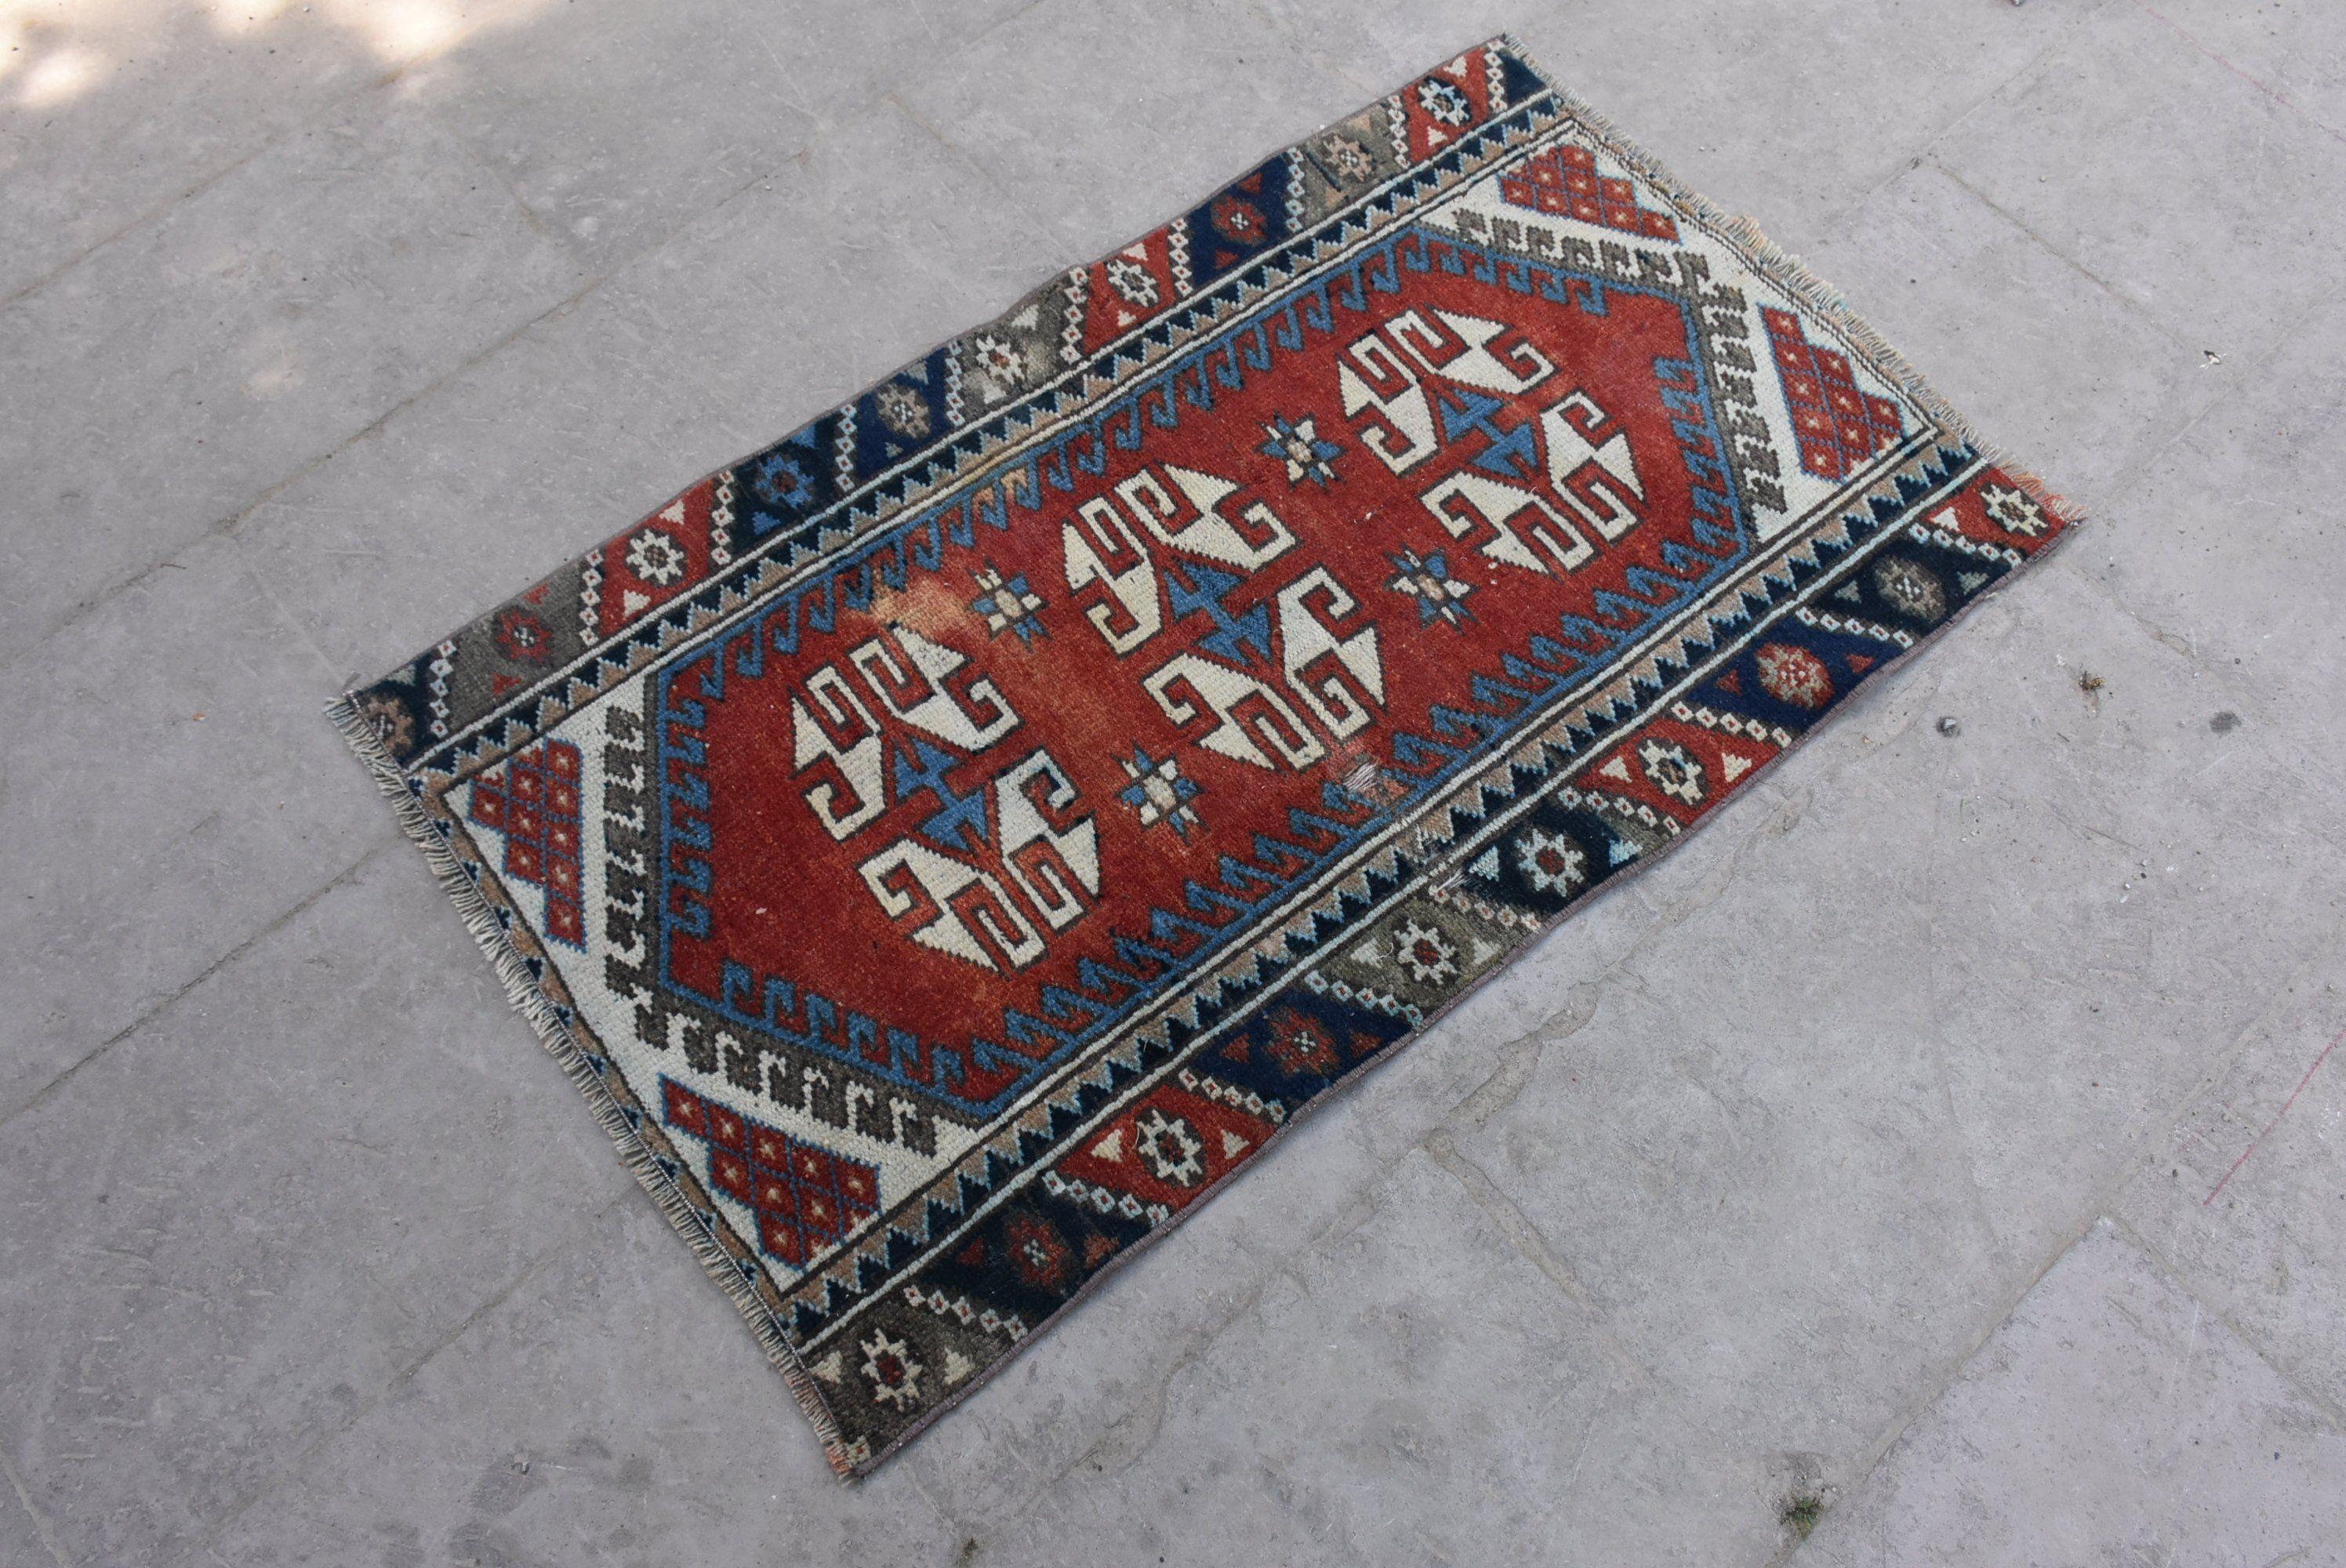 Antiques Nice Handwoven Turkish Kilim Rug Vintage Kilim Decorative Kilim Rug 4.9 Ft X 6.4 Ft